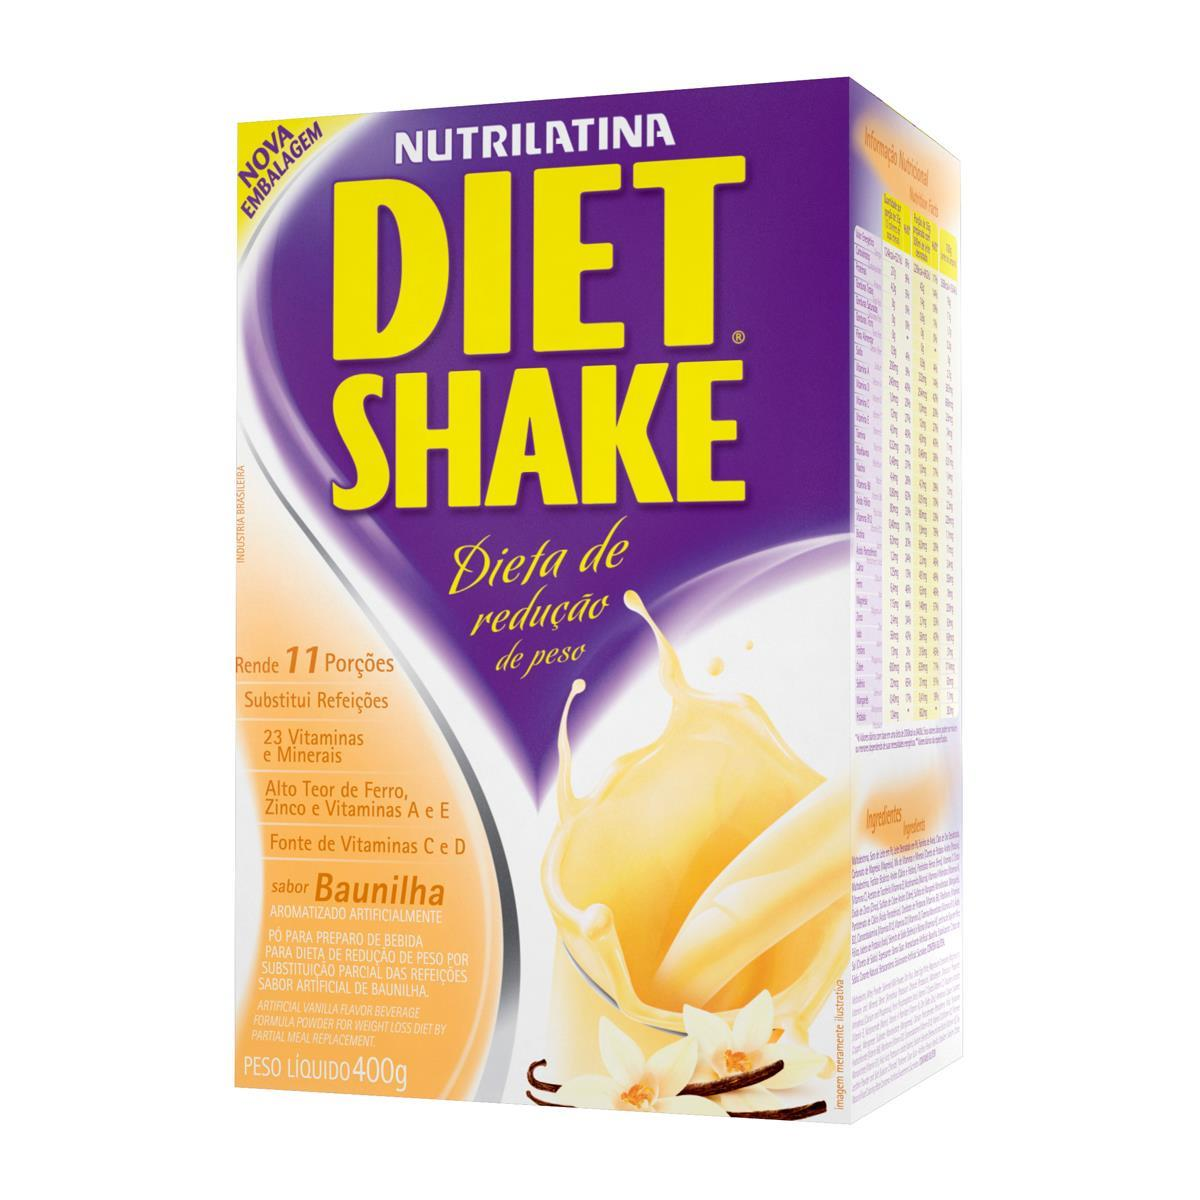 DIET SHAKE TRADICIONAL (400g) - Baunilha - AGE